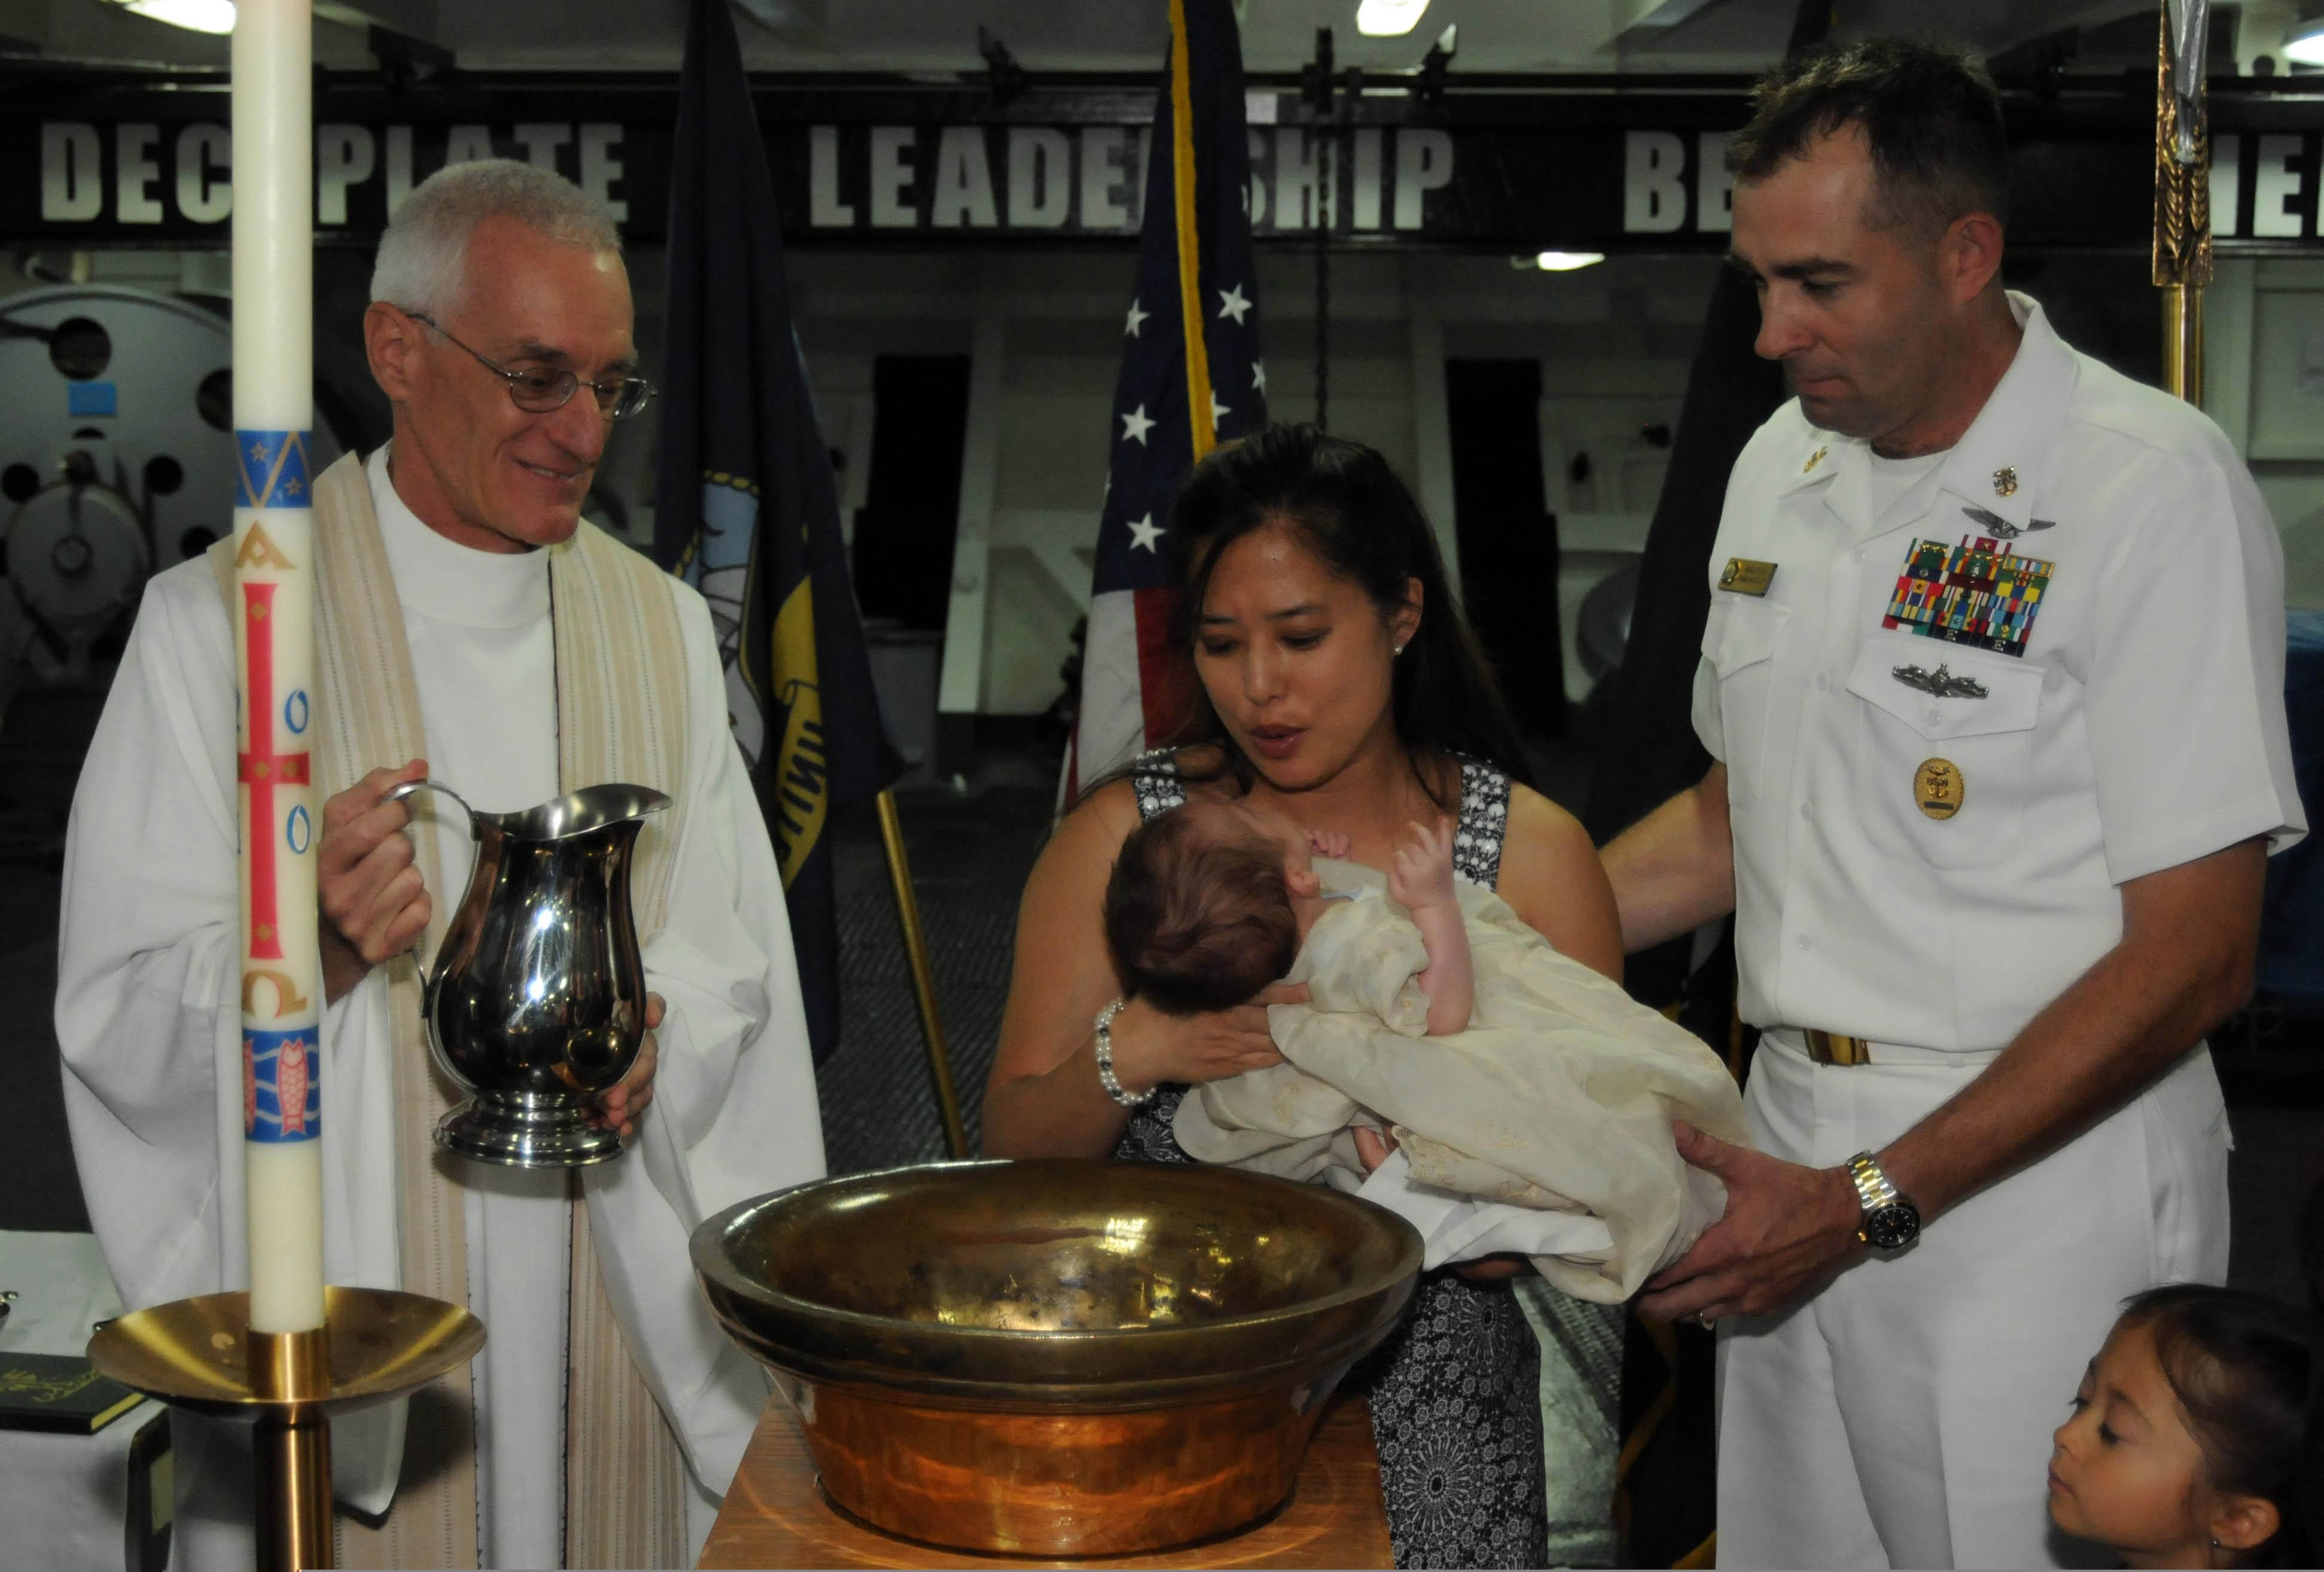 Baptism Aboard Uss Ronald Reagan